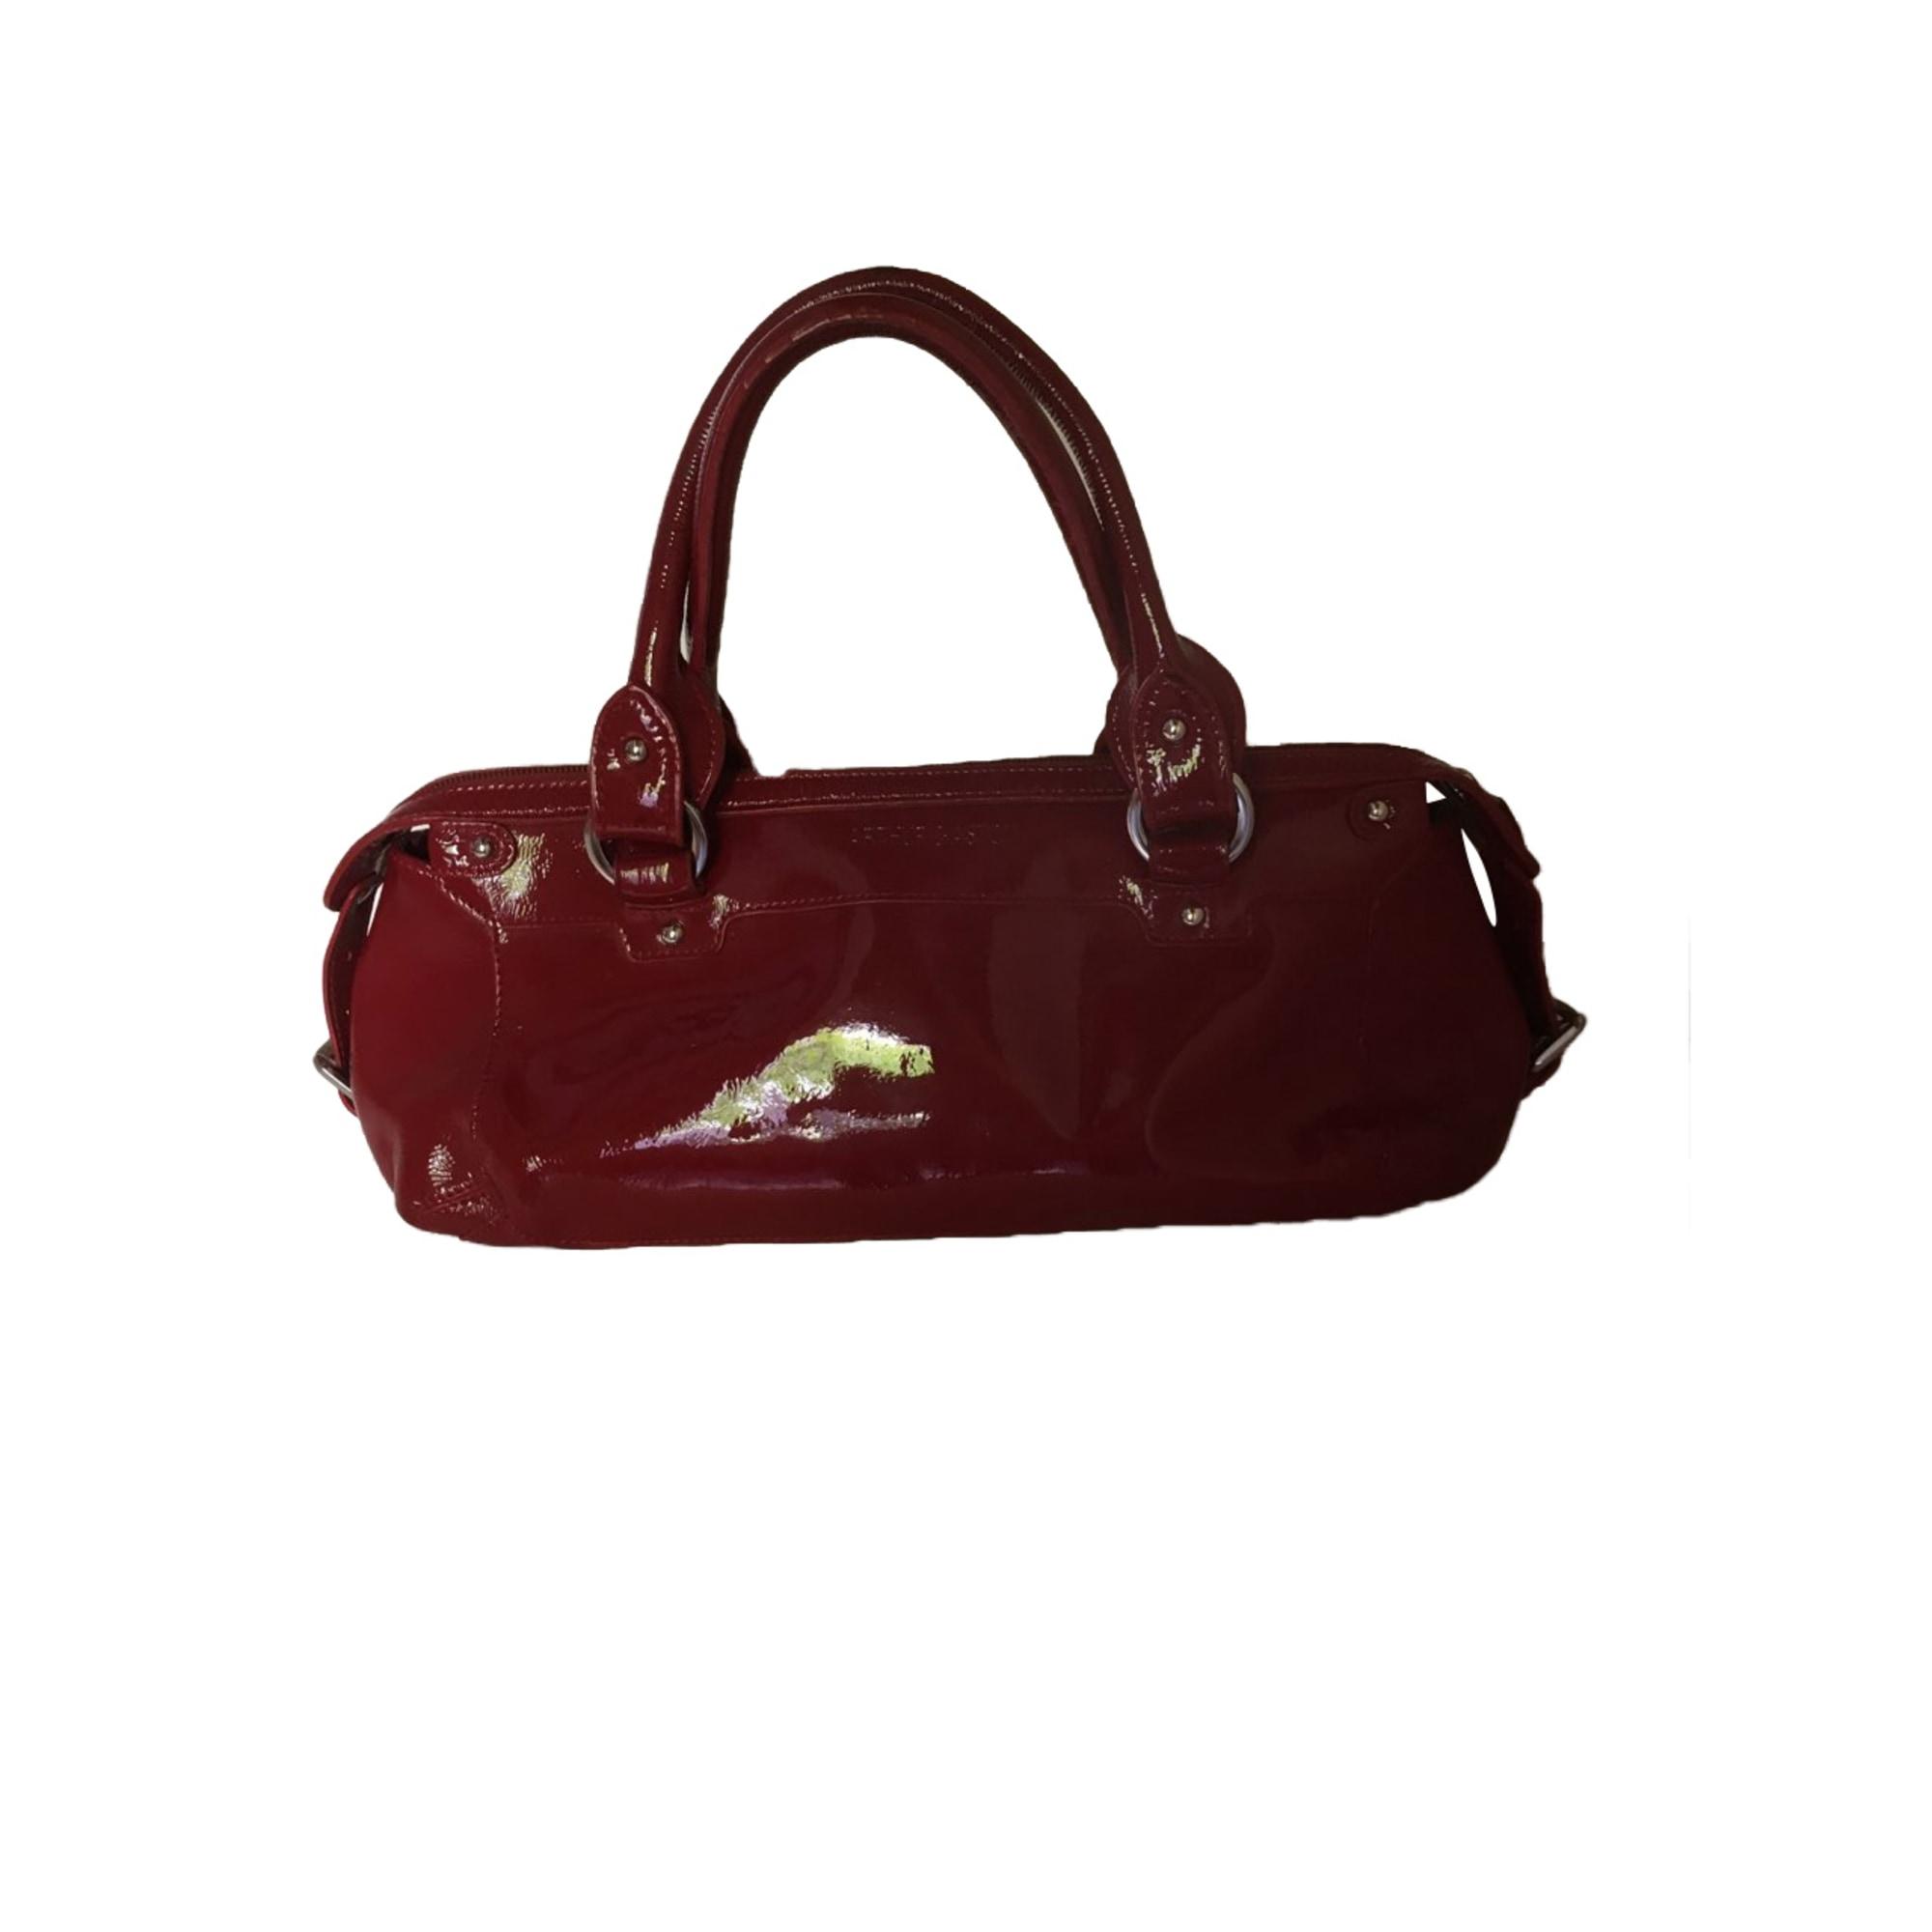 pelle rossa Borsa in Brachet venduta Arthur da Aston 7764176 7 4qqHRf